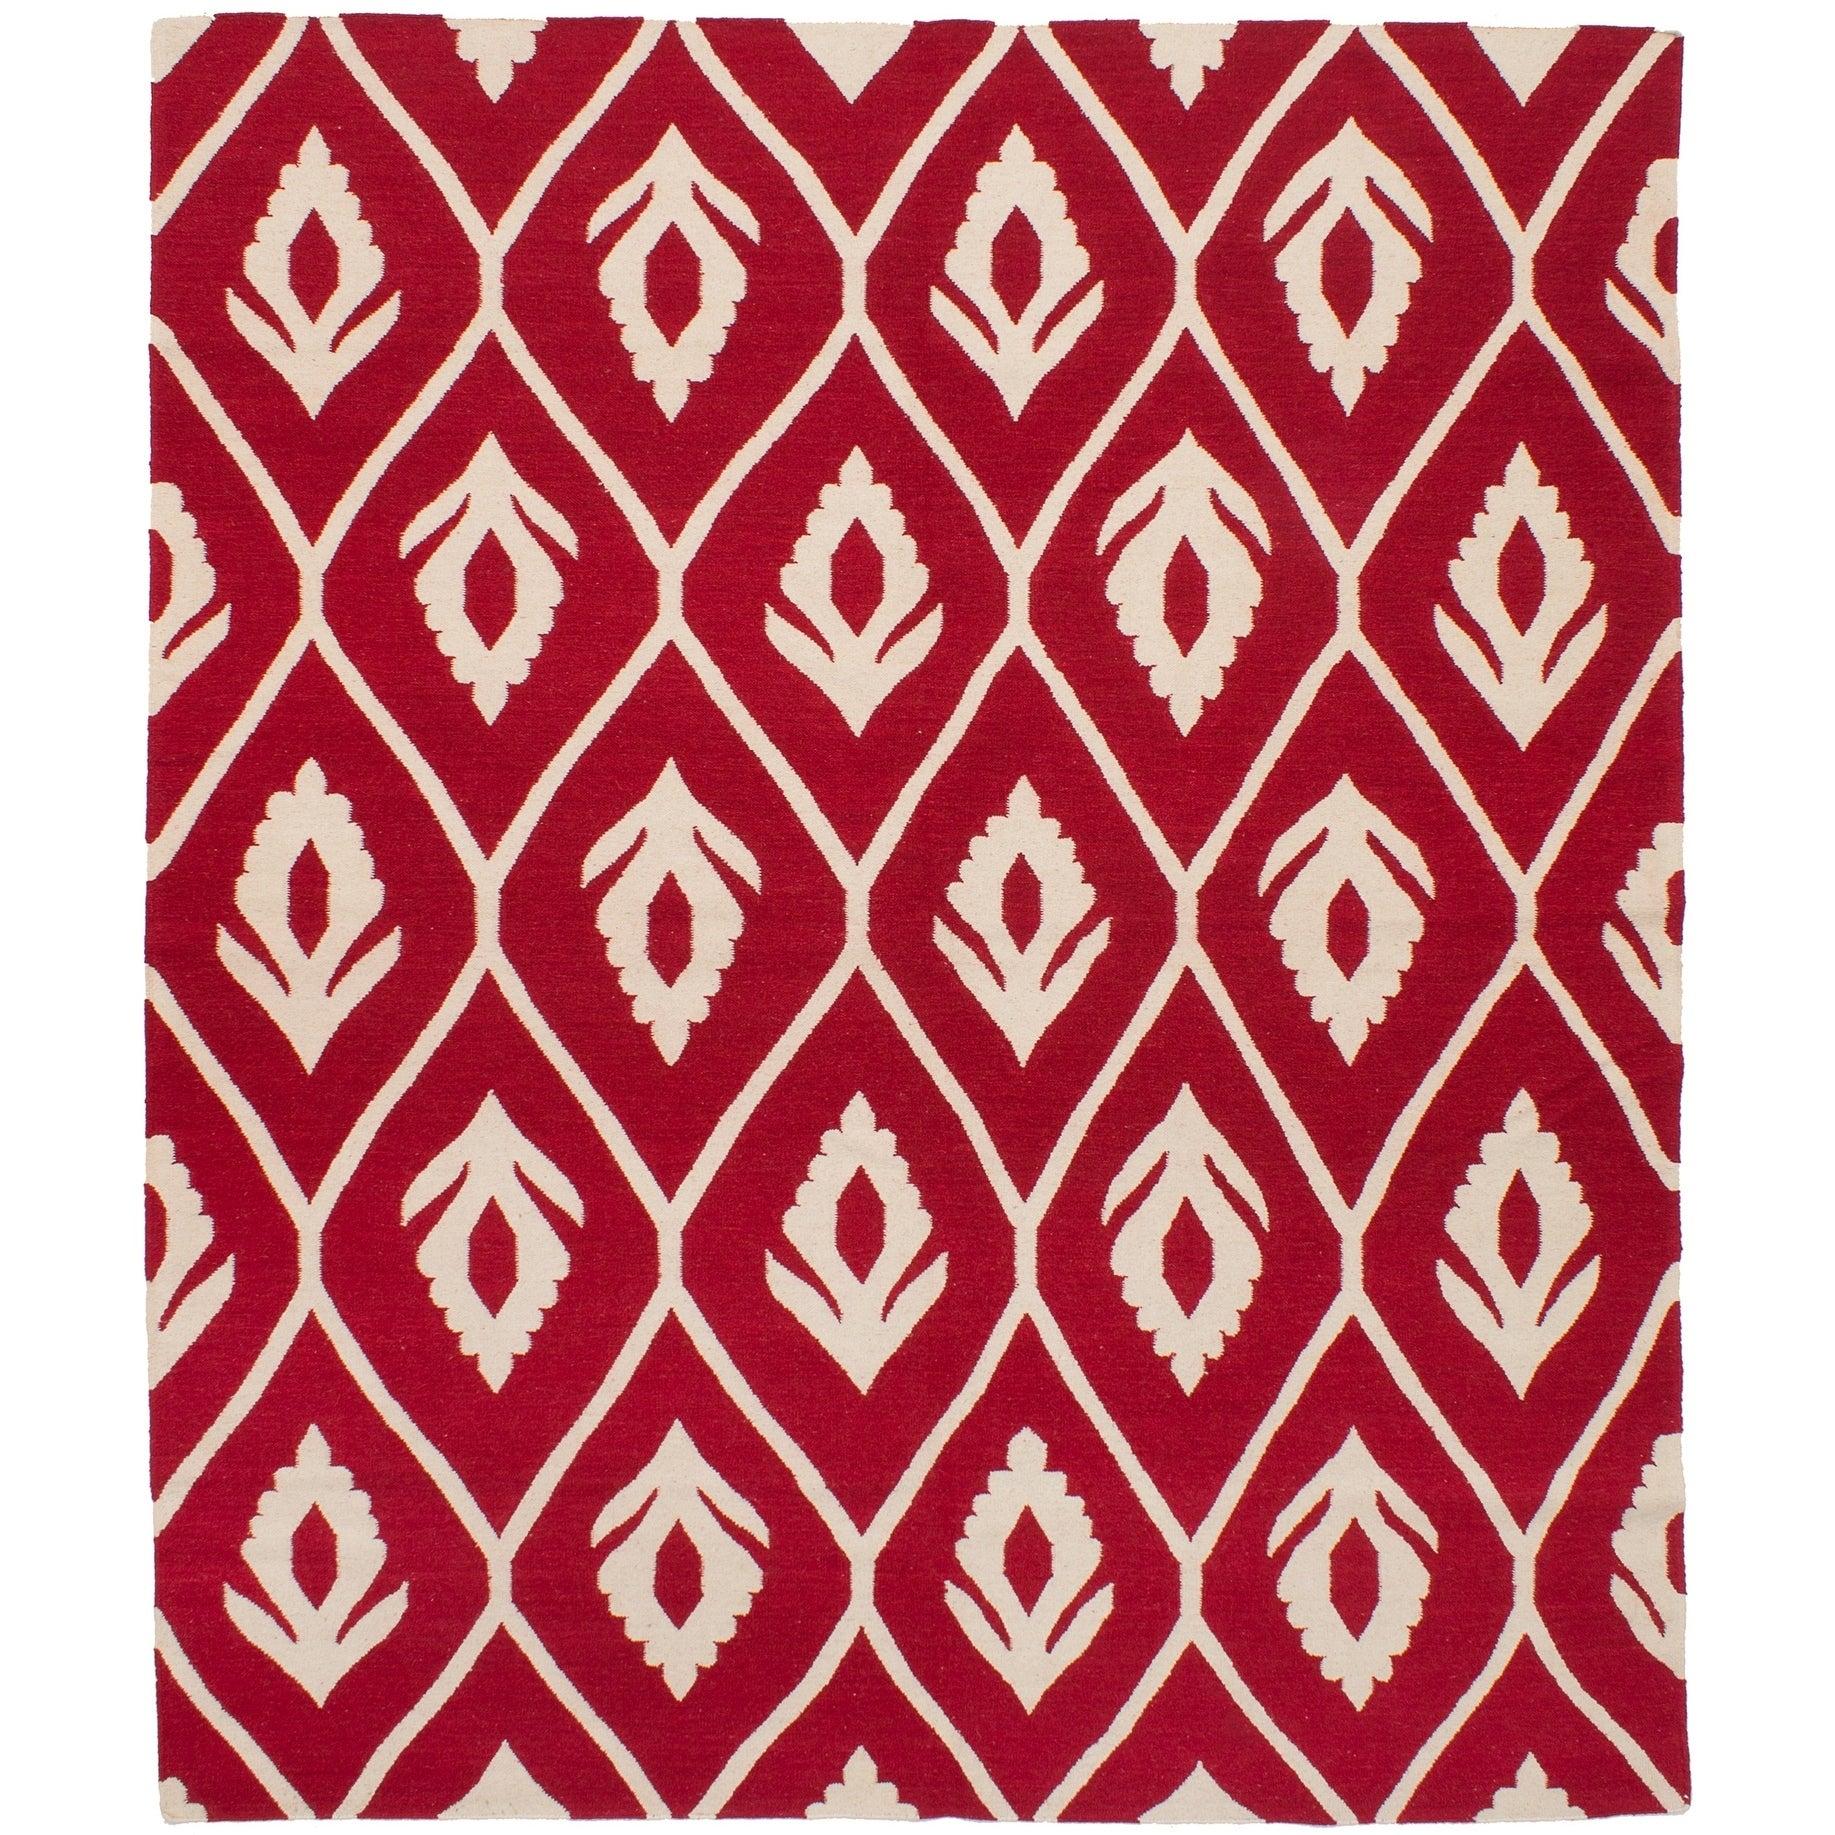 ECARPETGALLERY Flat-weave Ankara FW Red Wool Kilim - 82 x 911 (RED - 82 x 911)